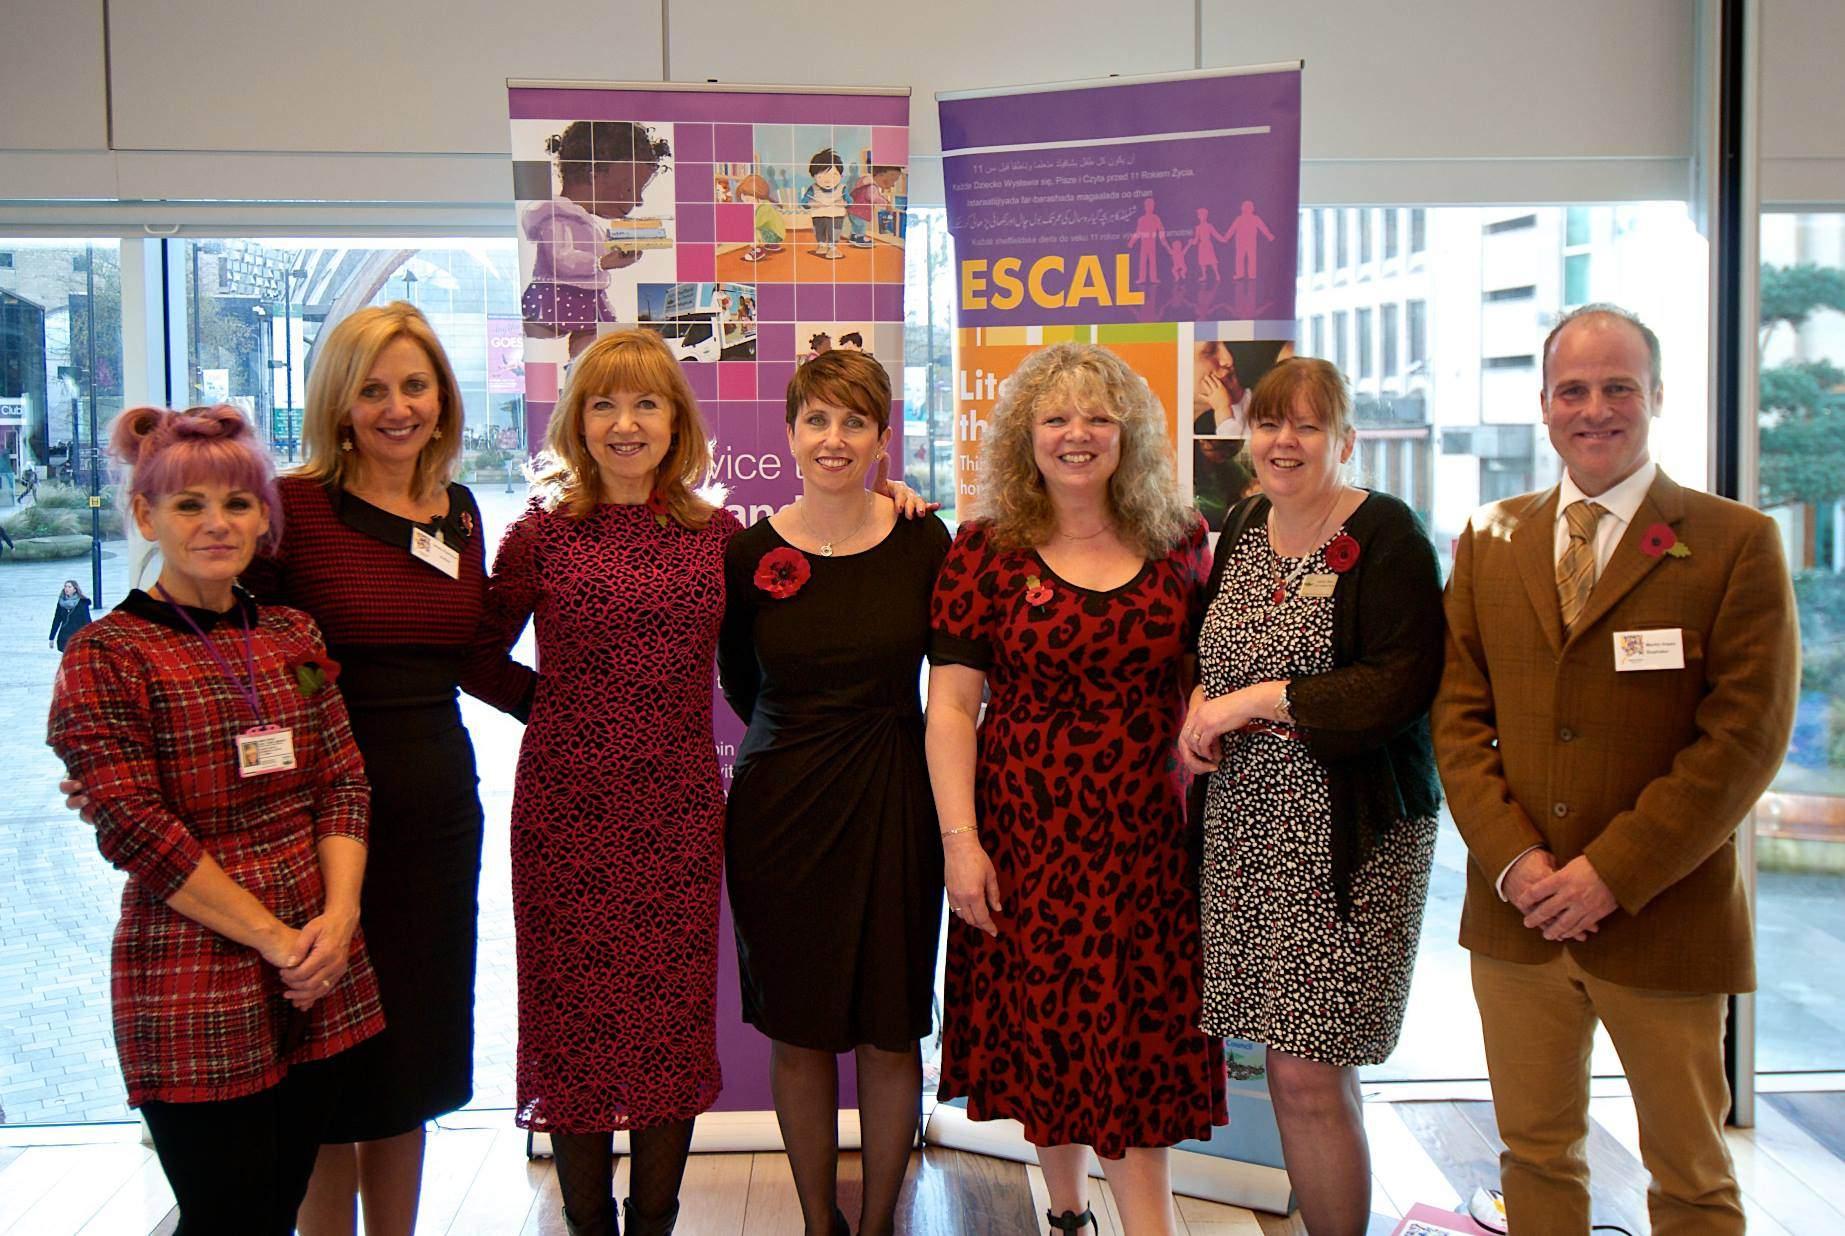 Sheffield Children's Book Award 2014